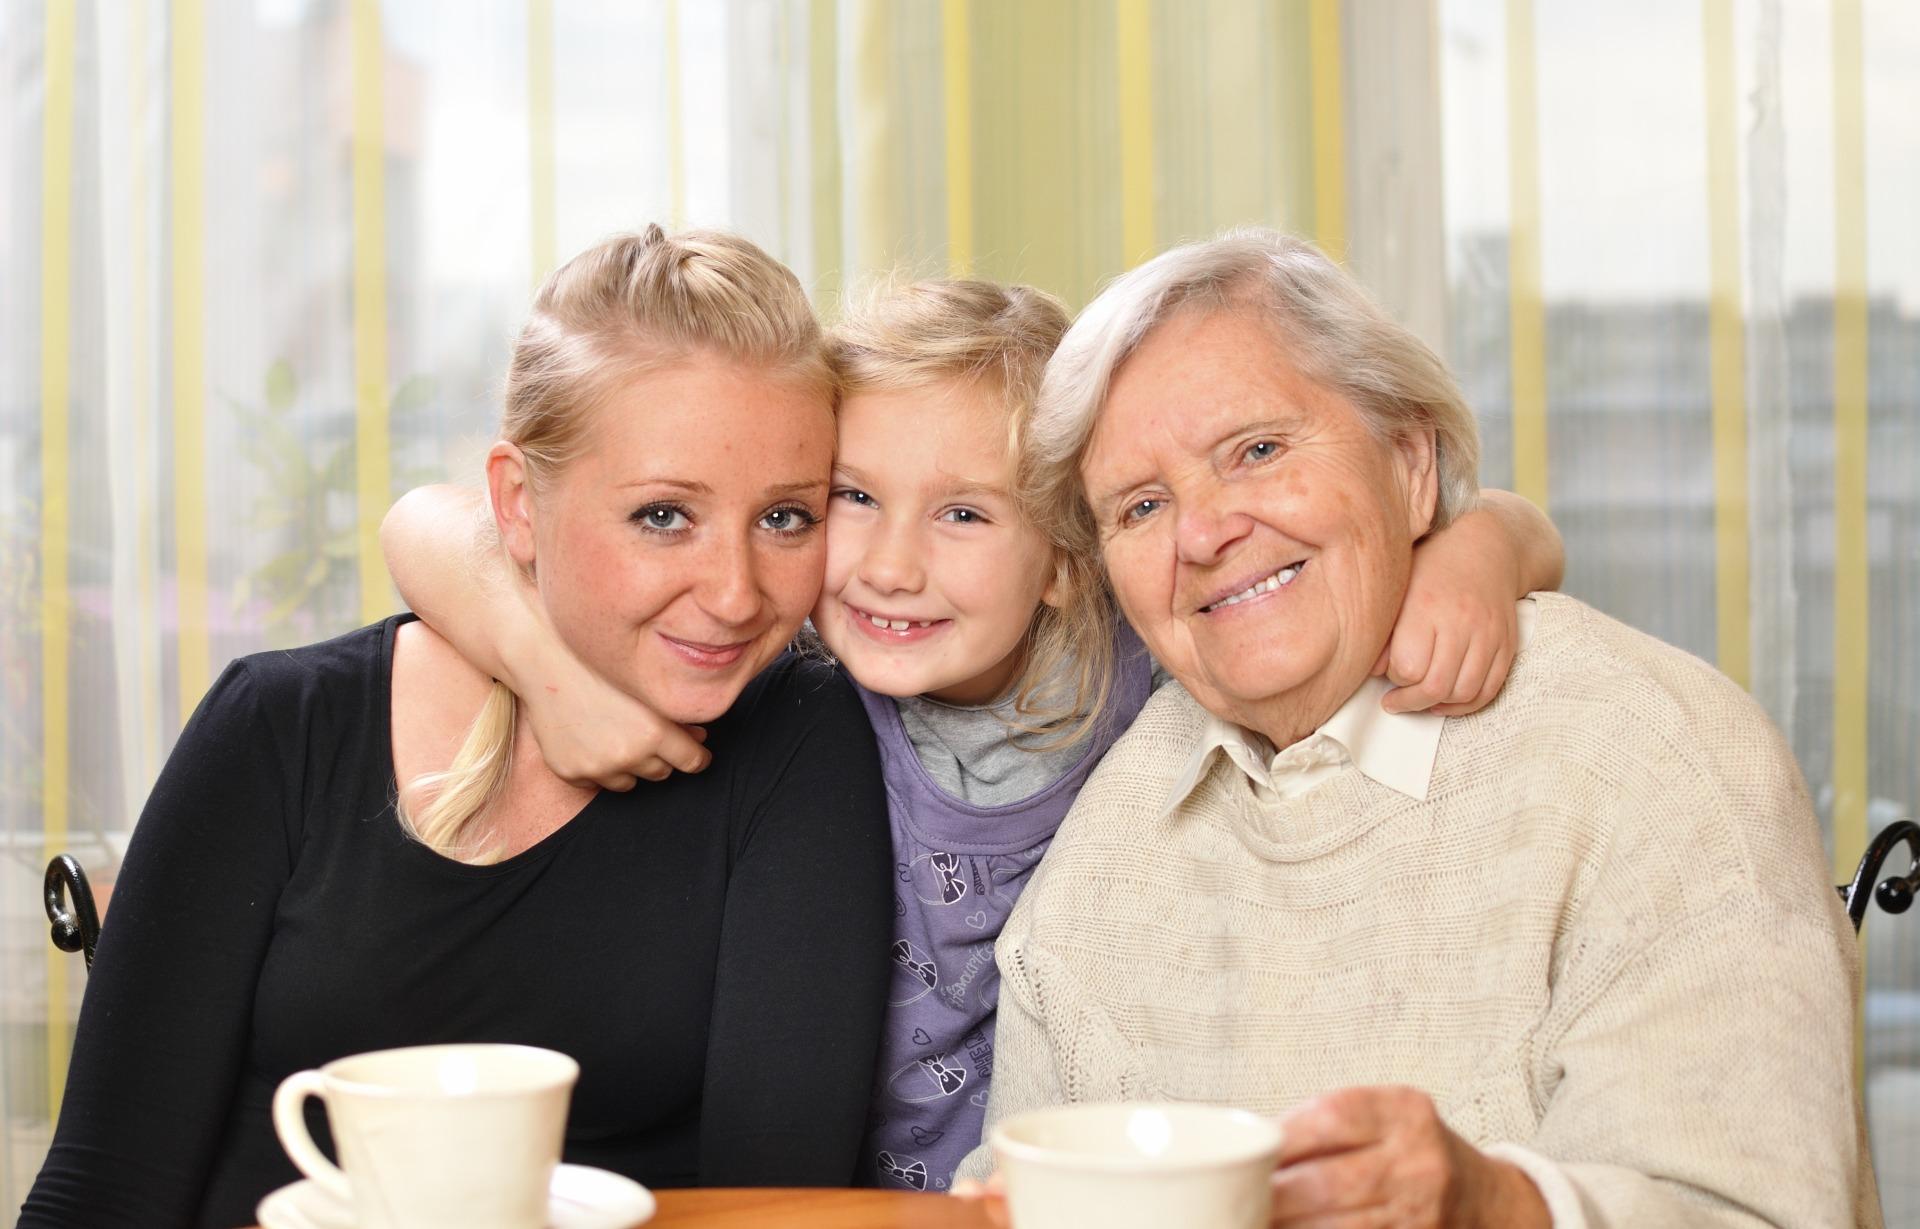 Three women, three generations. Happy and smiling.